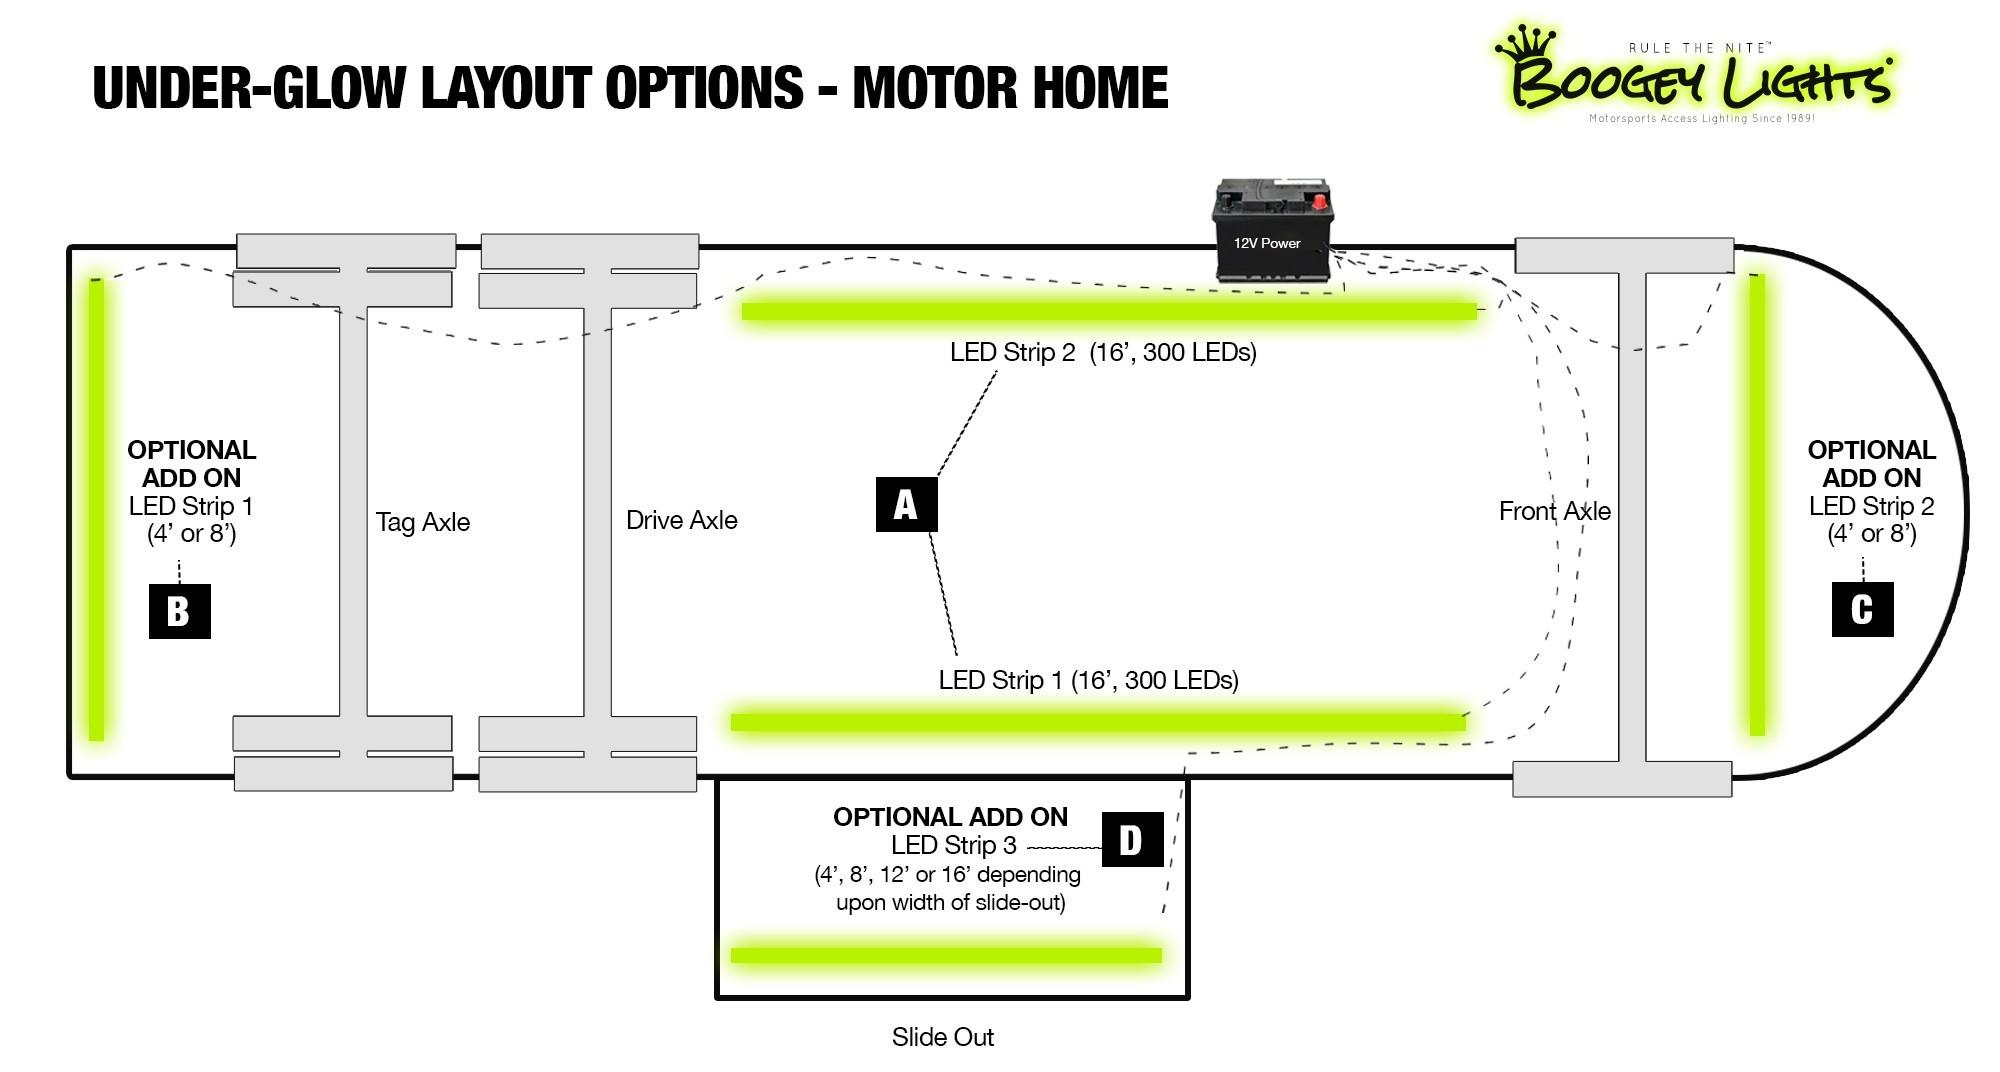 Boat Trailer Lights Wiring Diagram Blazer Led Trailer Light Wiring Diagram solutions 20 2 Of Boat Trailer Lights Wiring Diagram